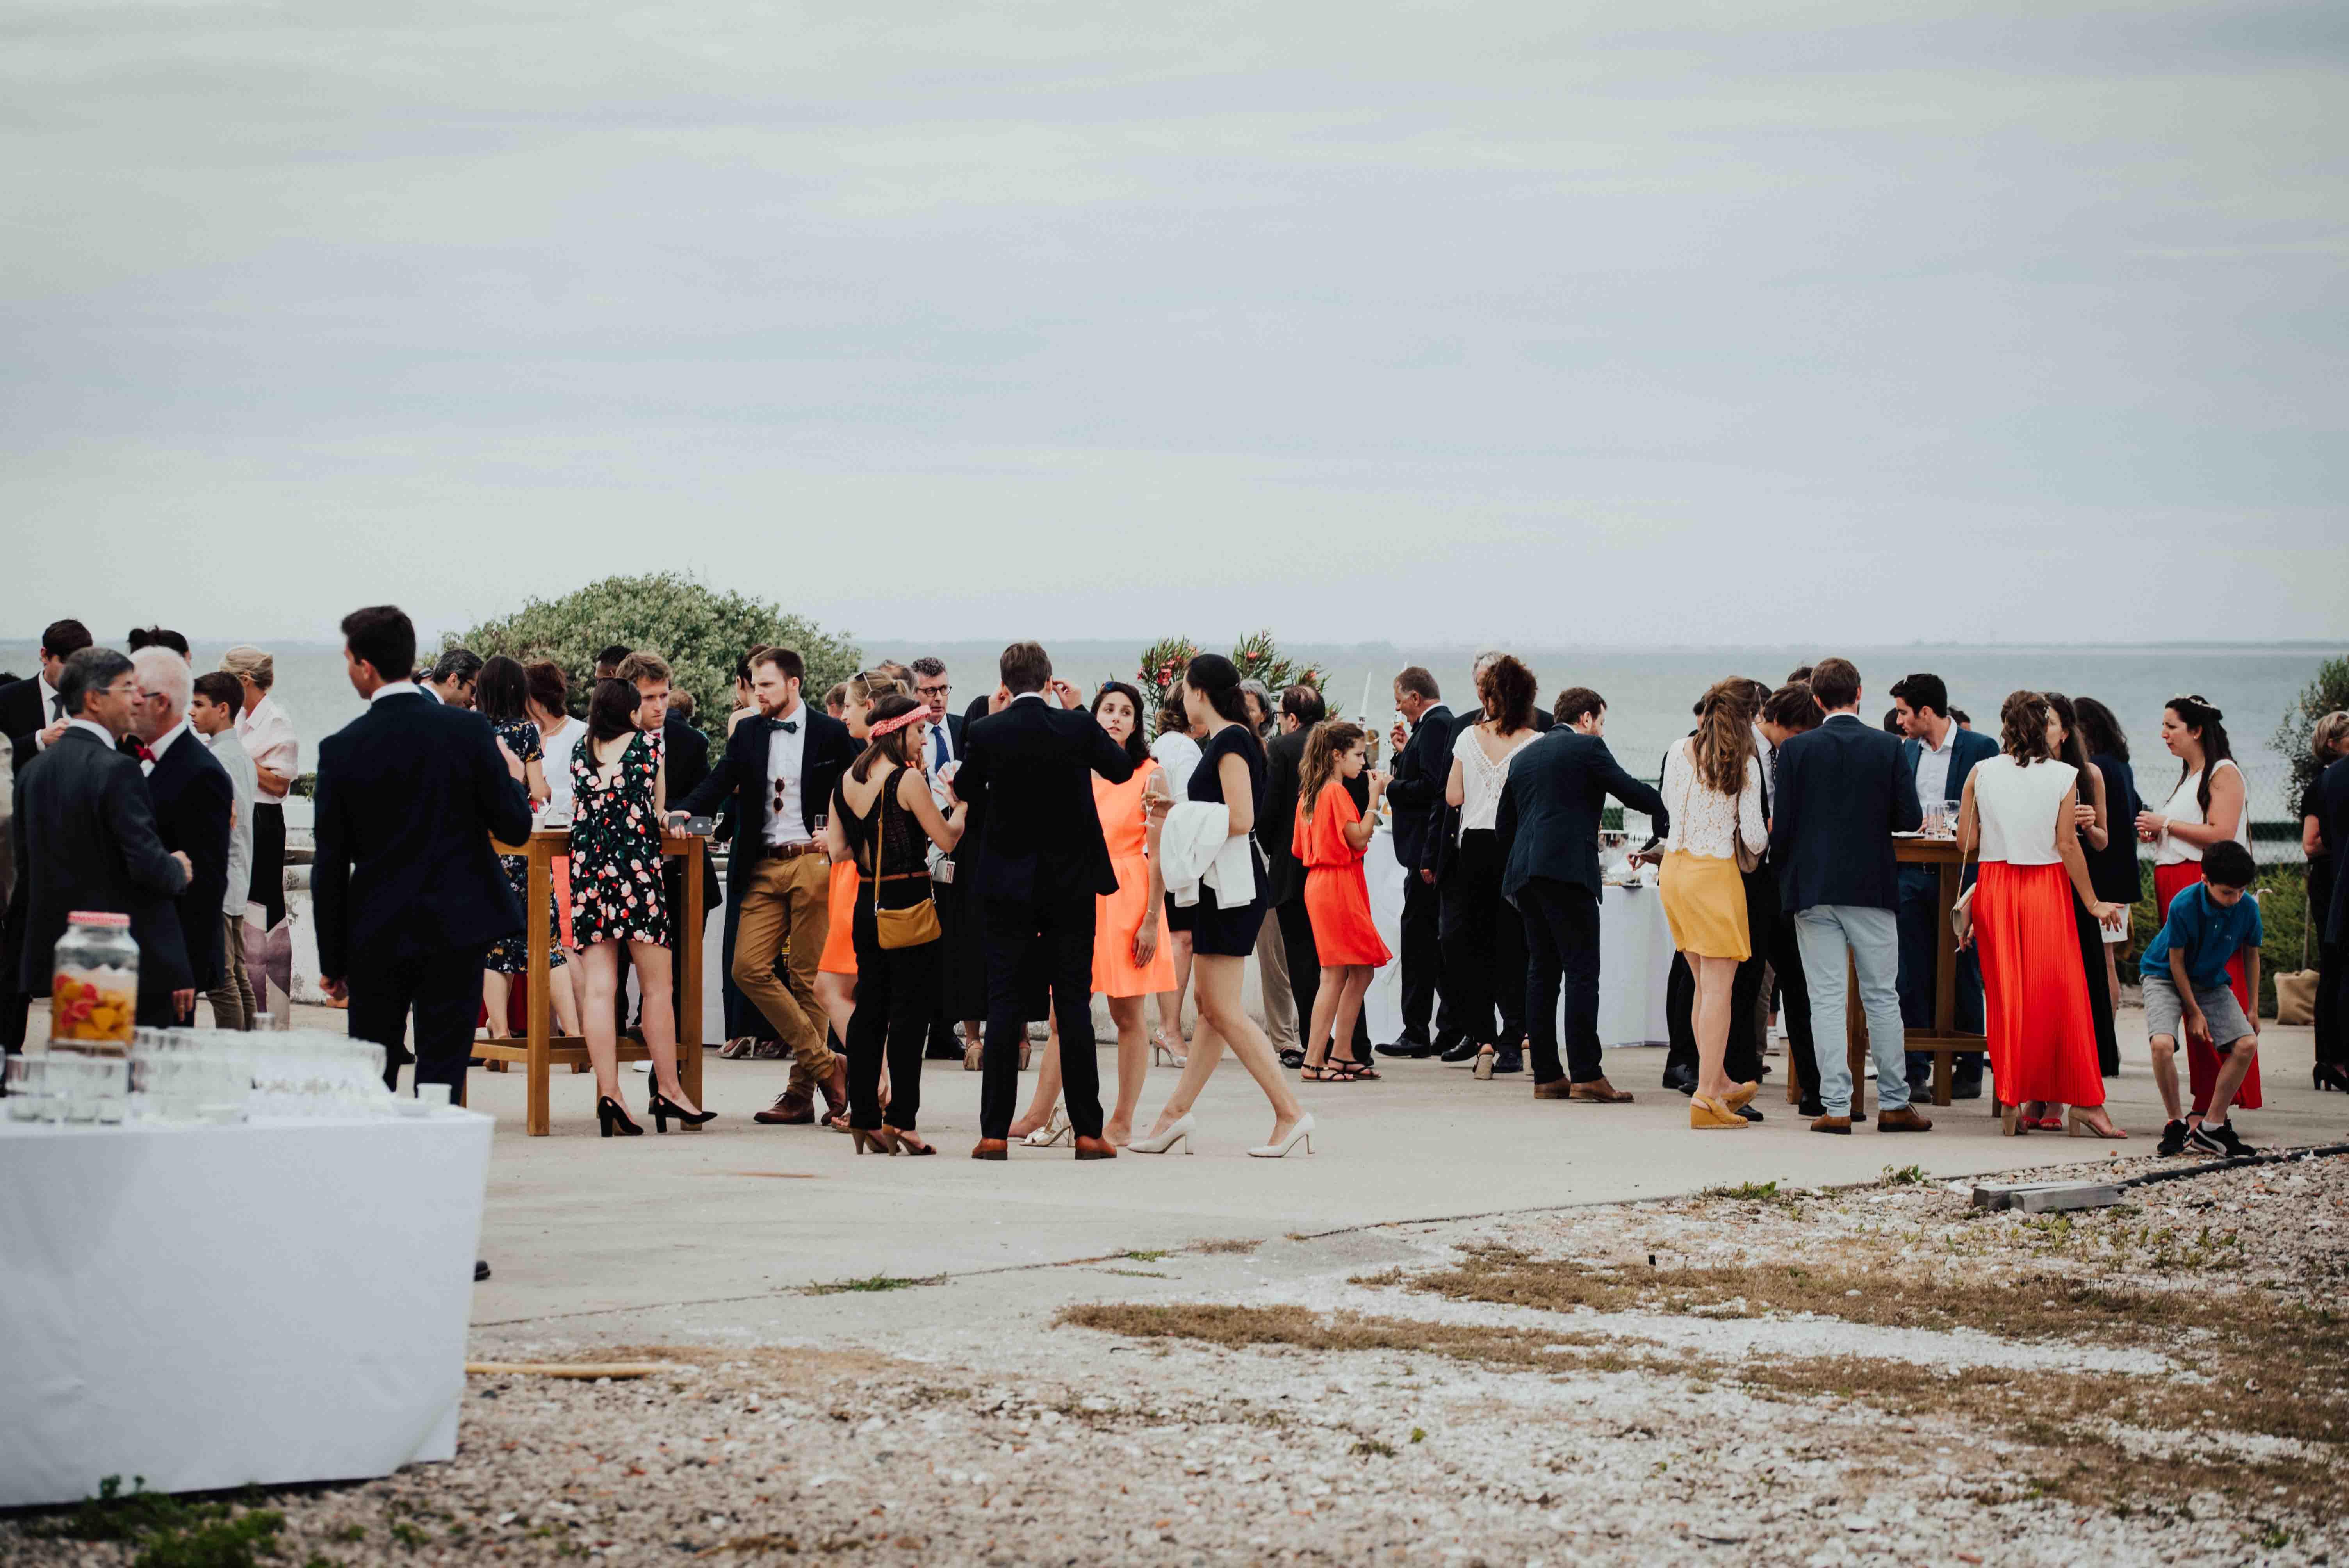 lieu mariage ostreiculteur ile de re